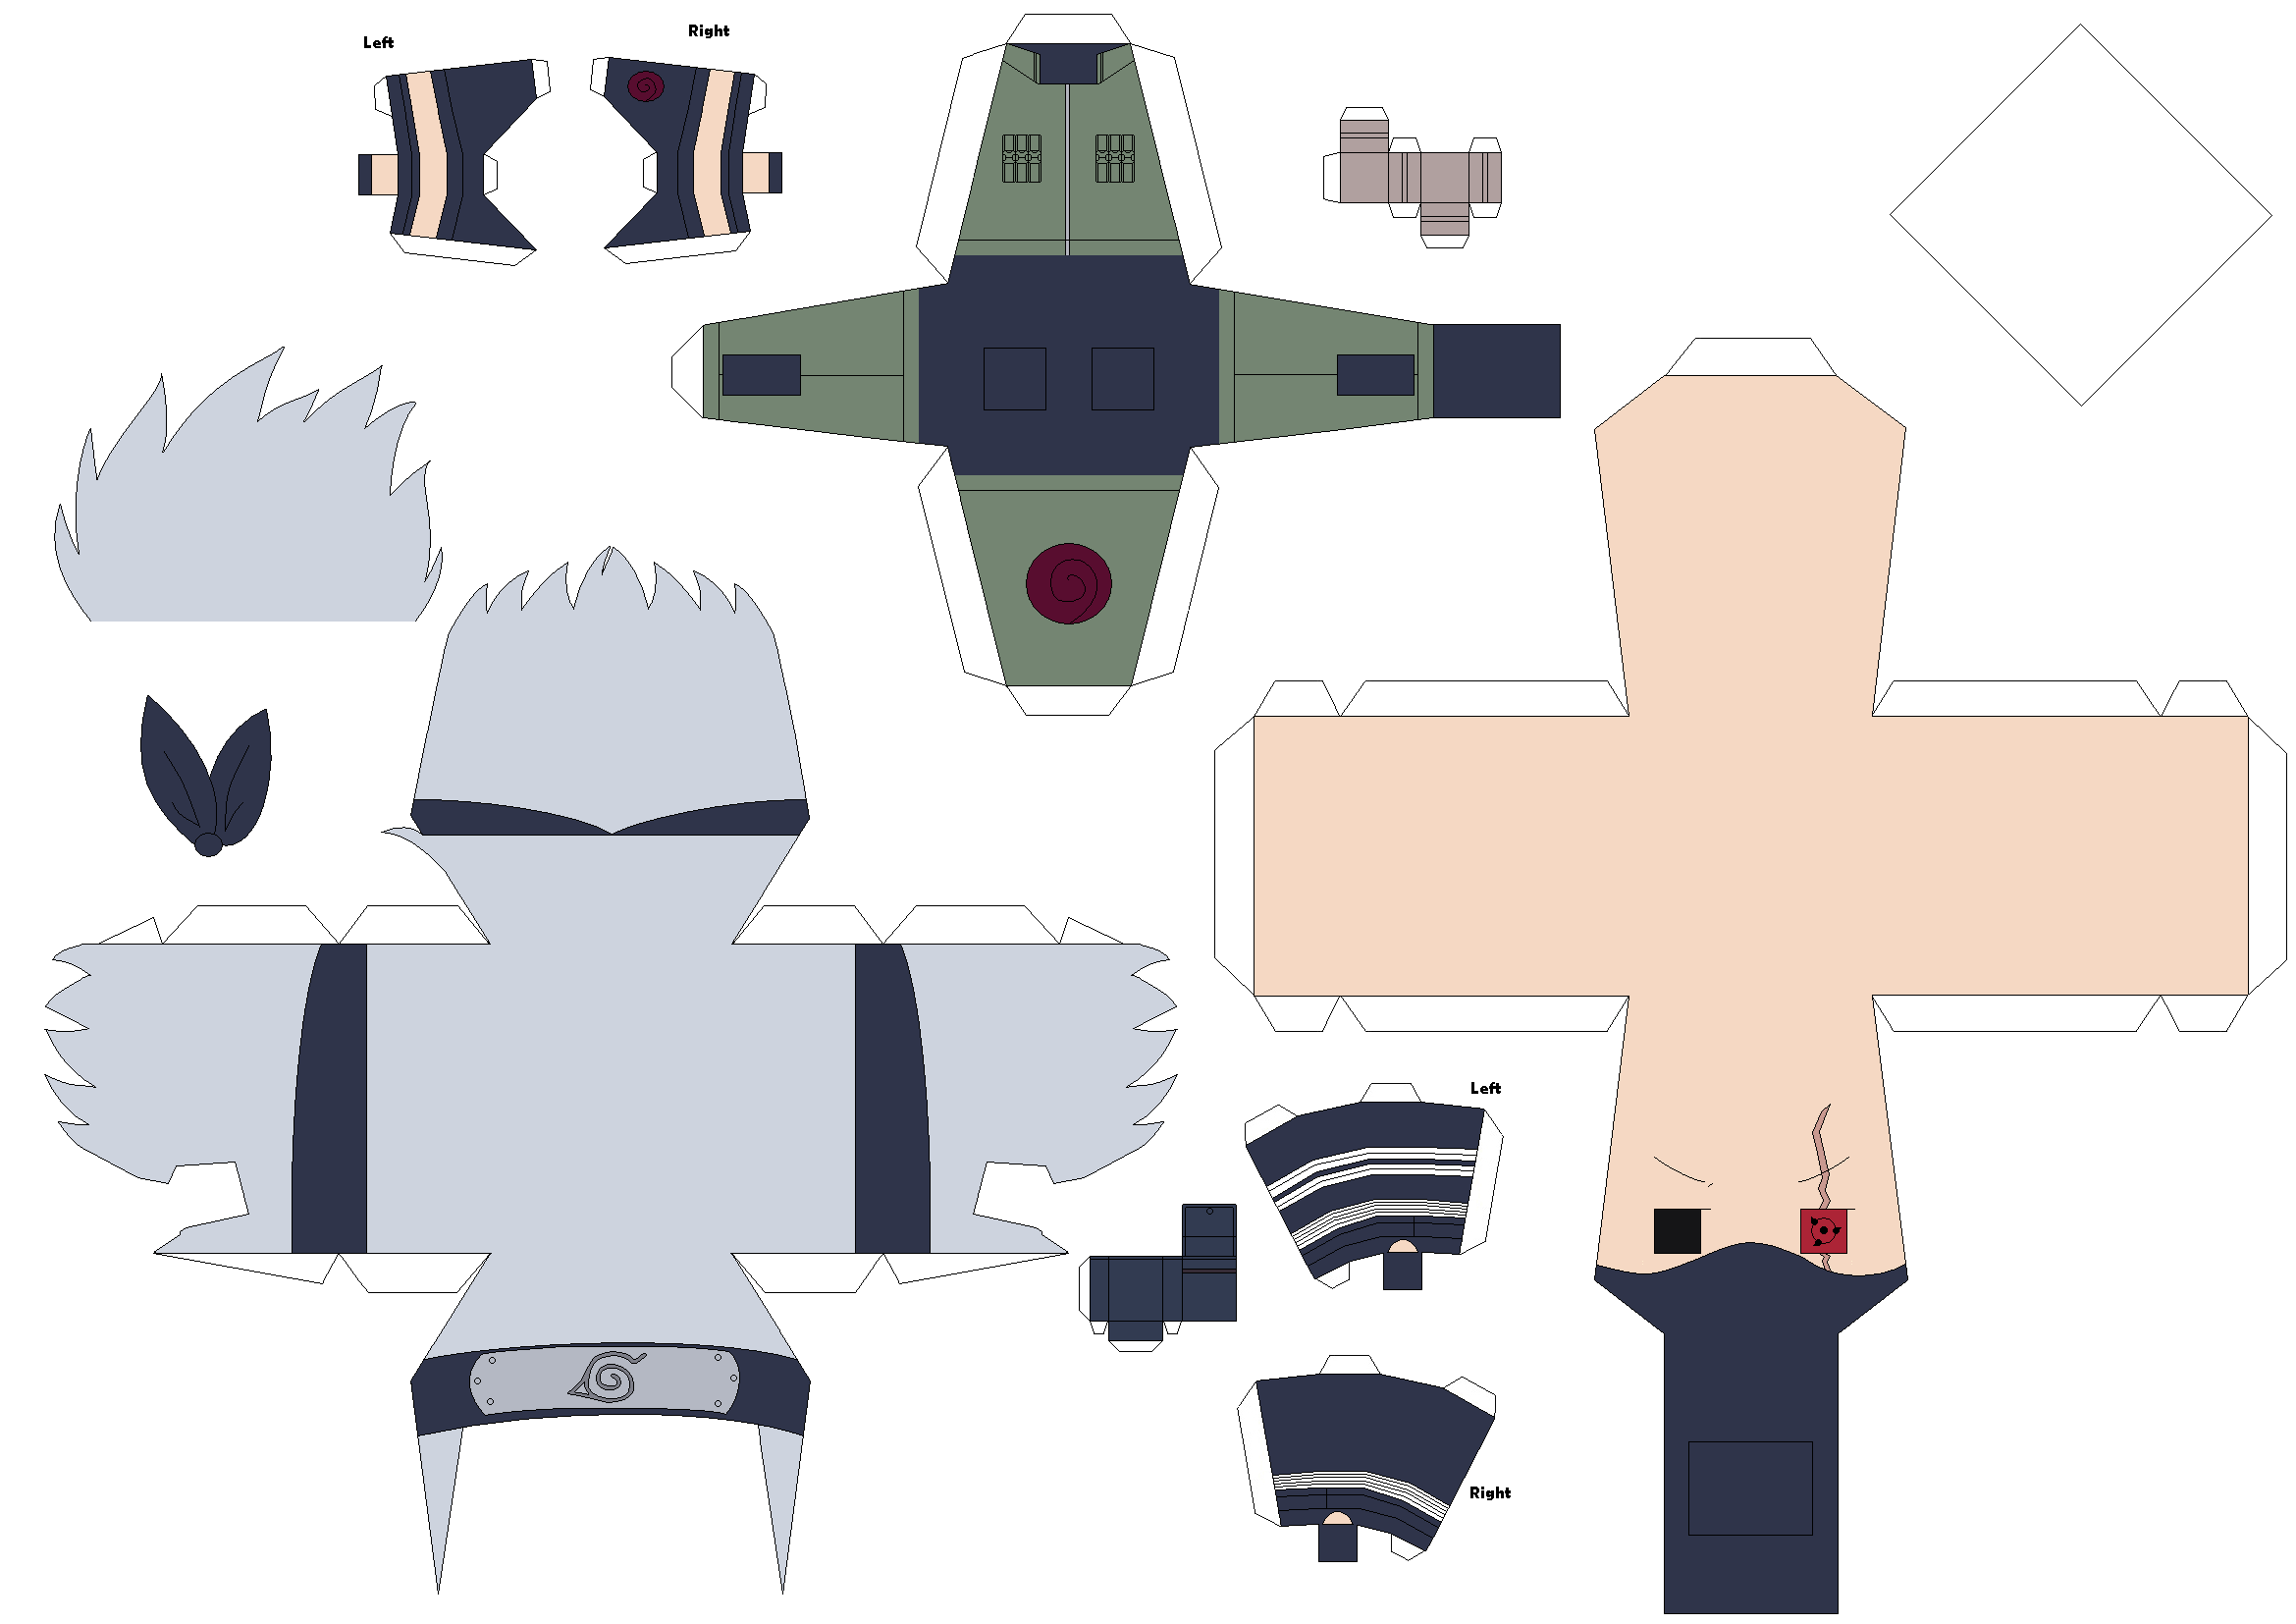 Sharingan Kakashi Papercraft Template - Request by Huski-Fan